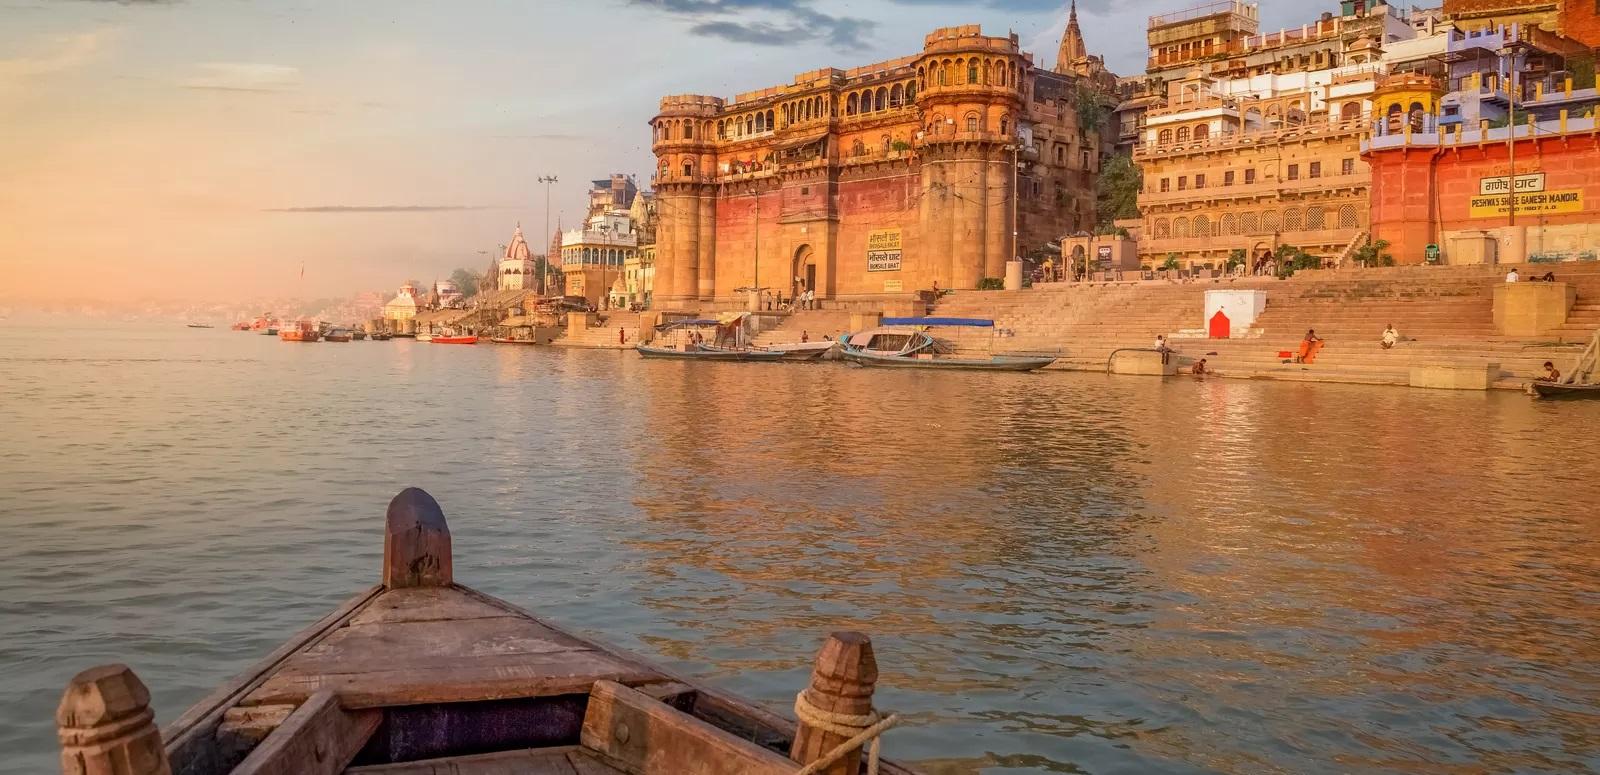 5 best souvenirs you must buy from varanasi - jagdish das